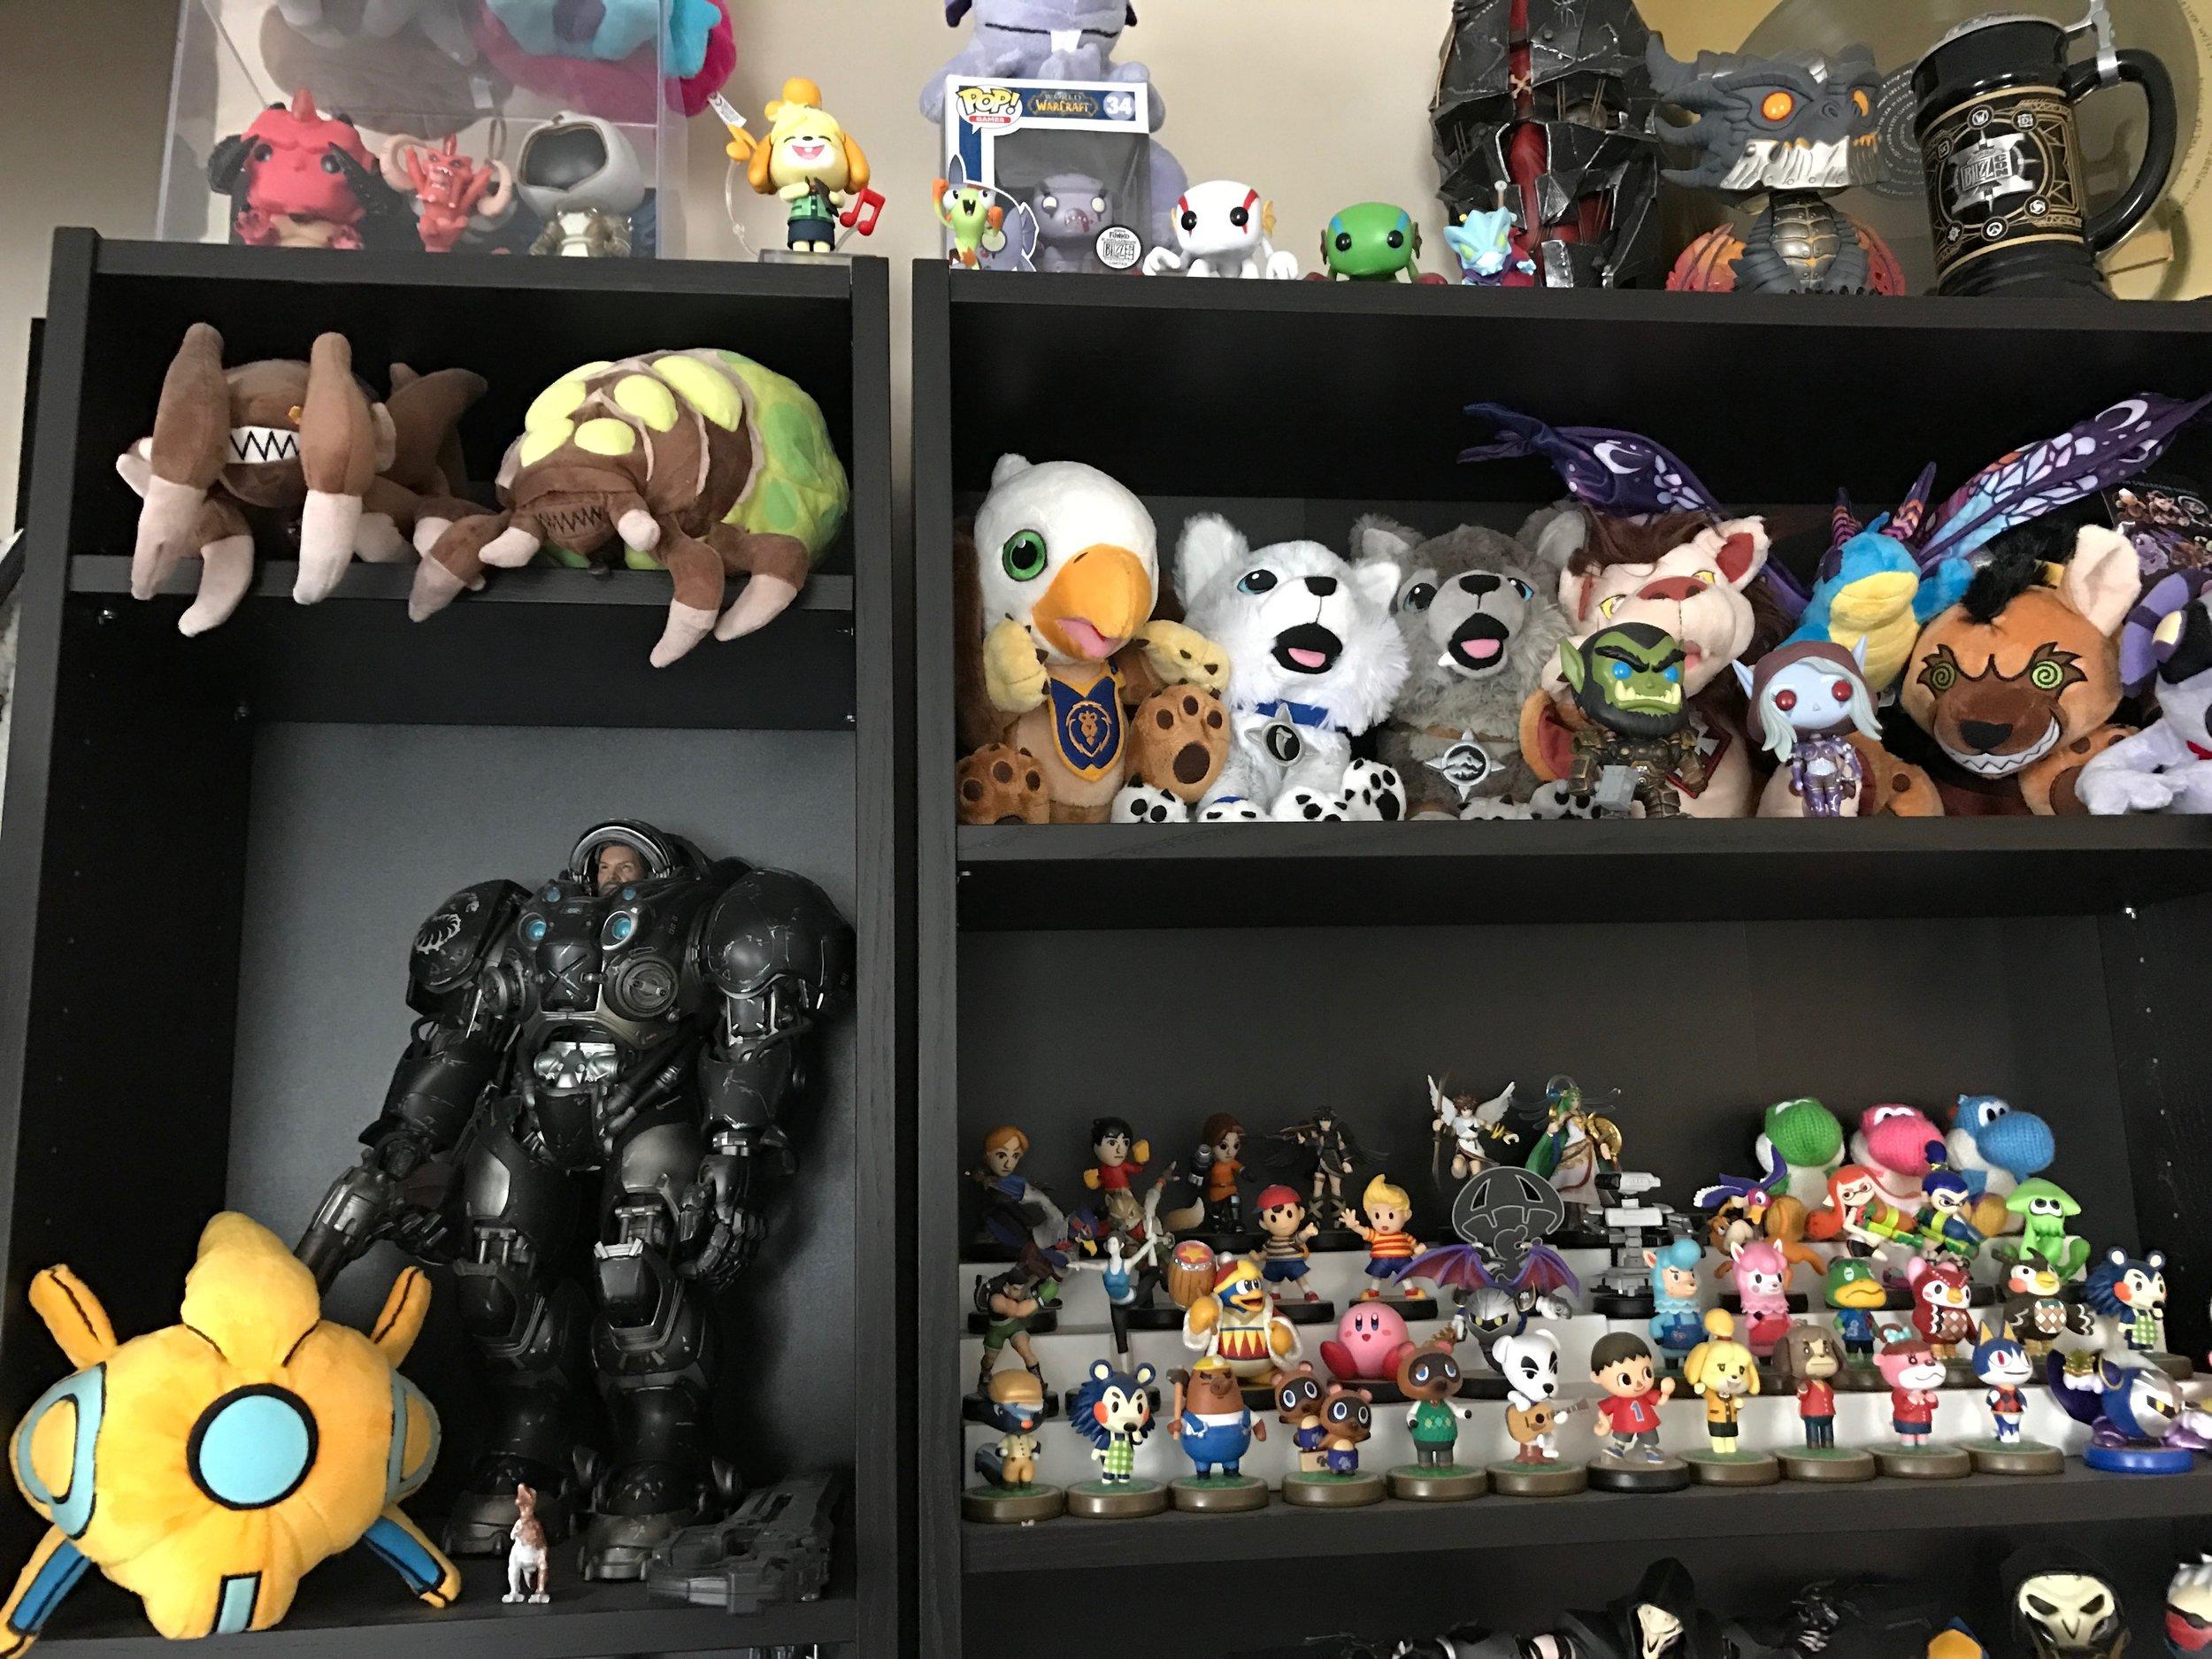 The Blizzard & Amiibo Shelf